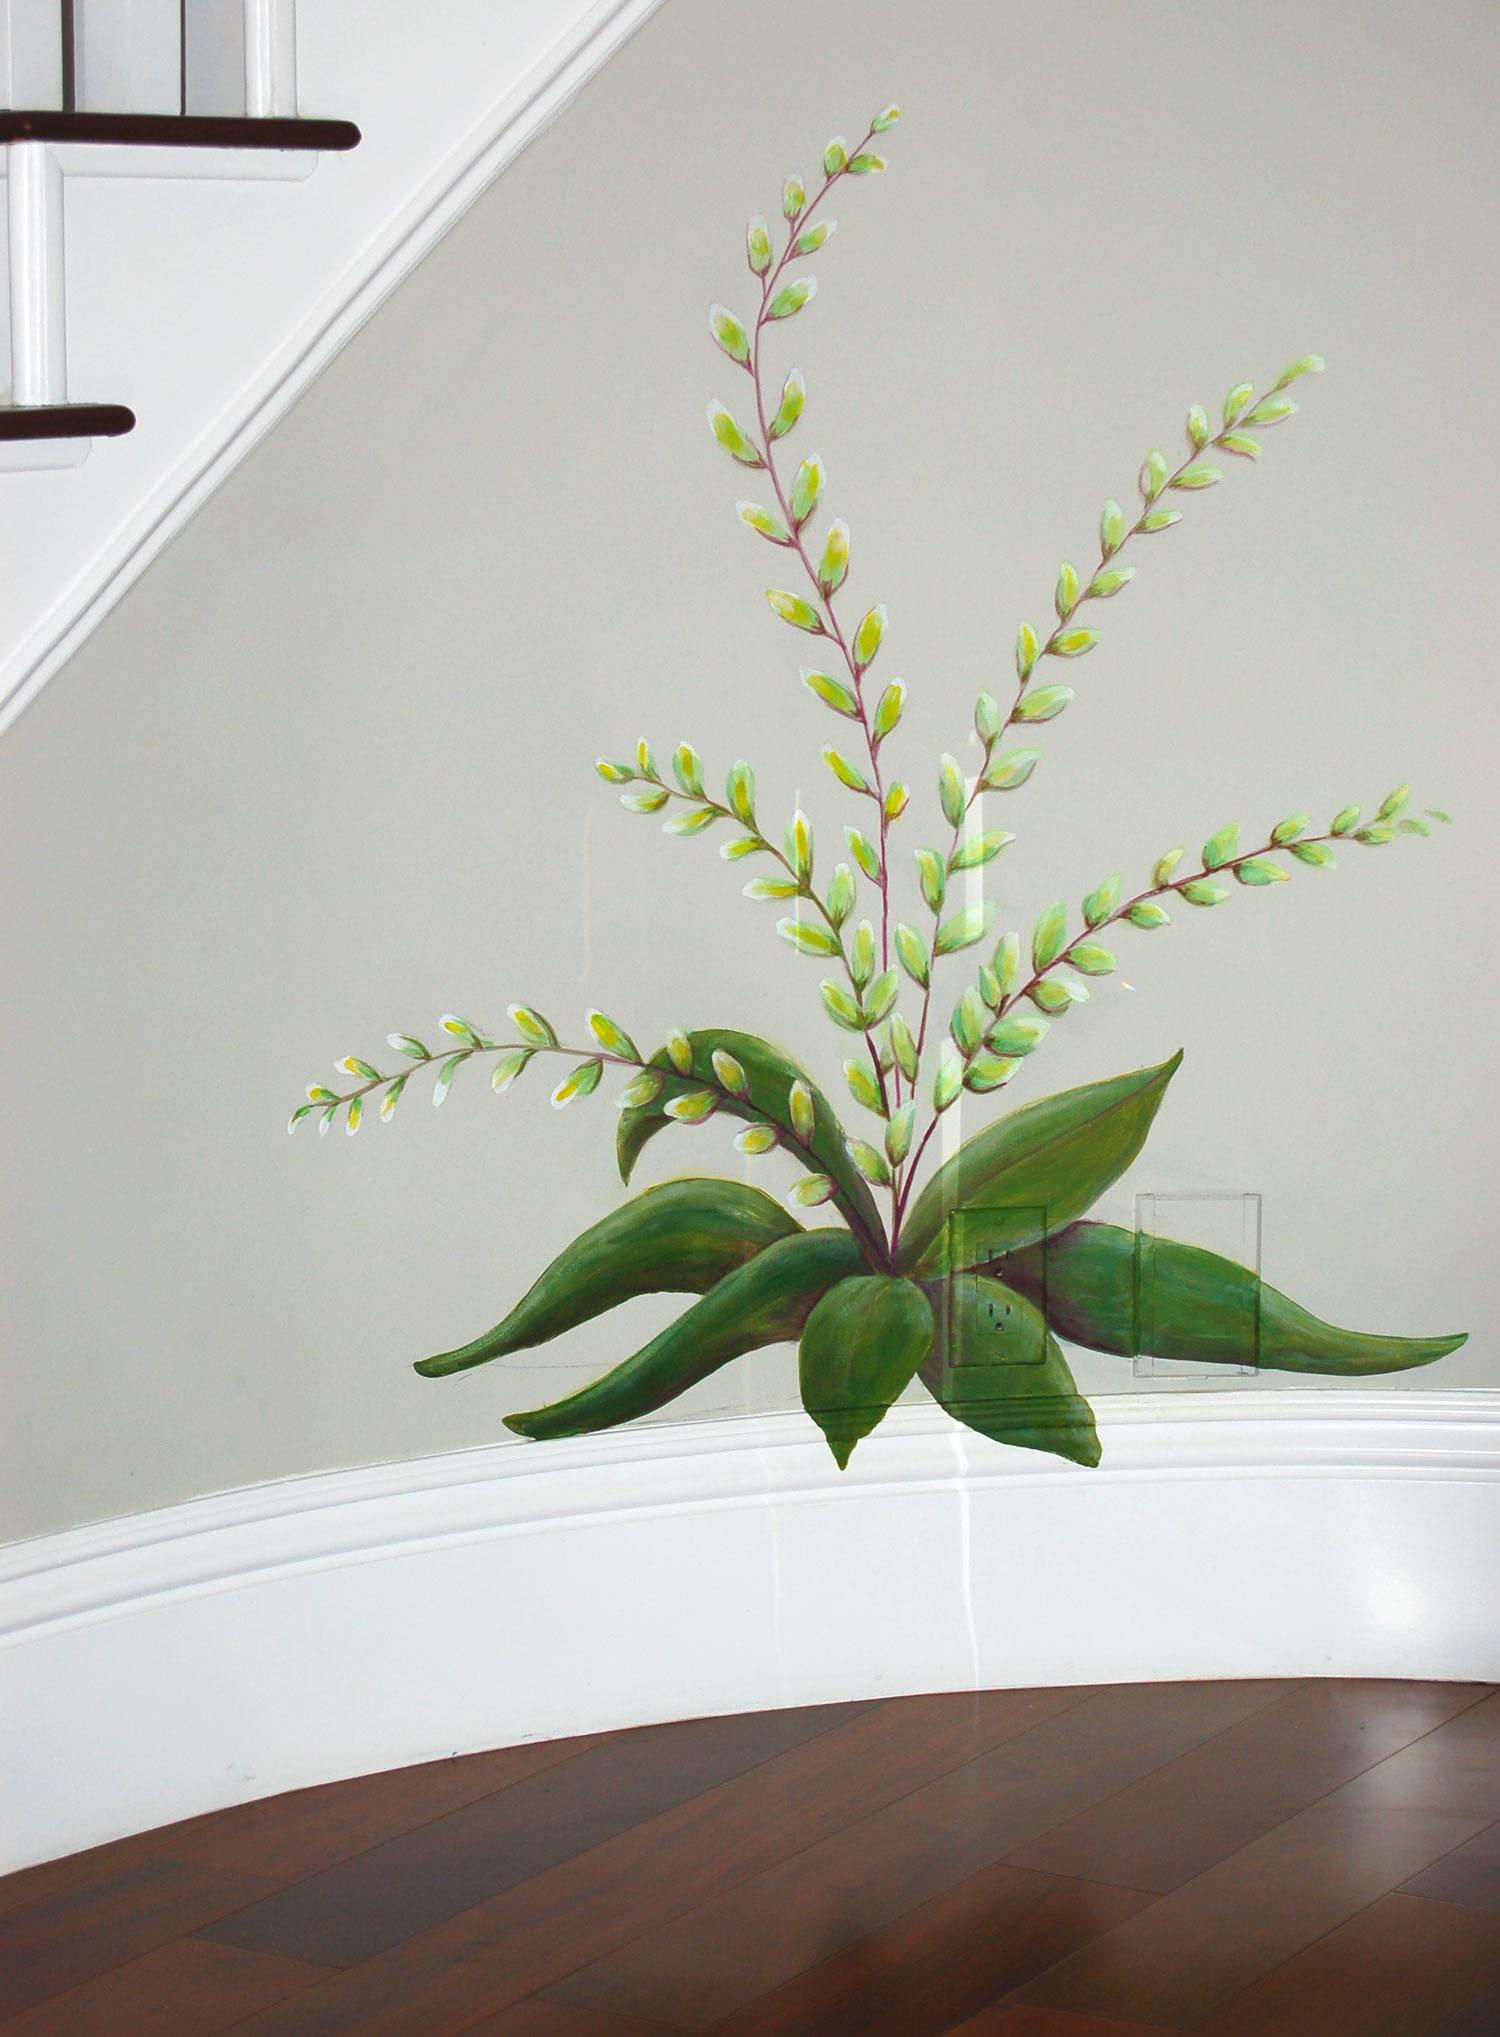 Hallway decorative painting